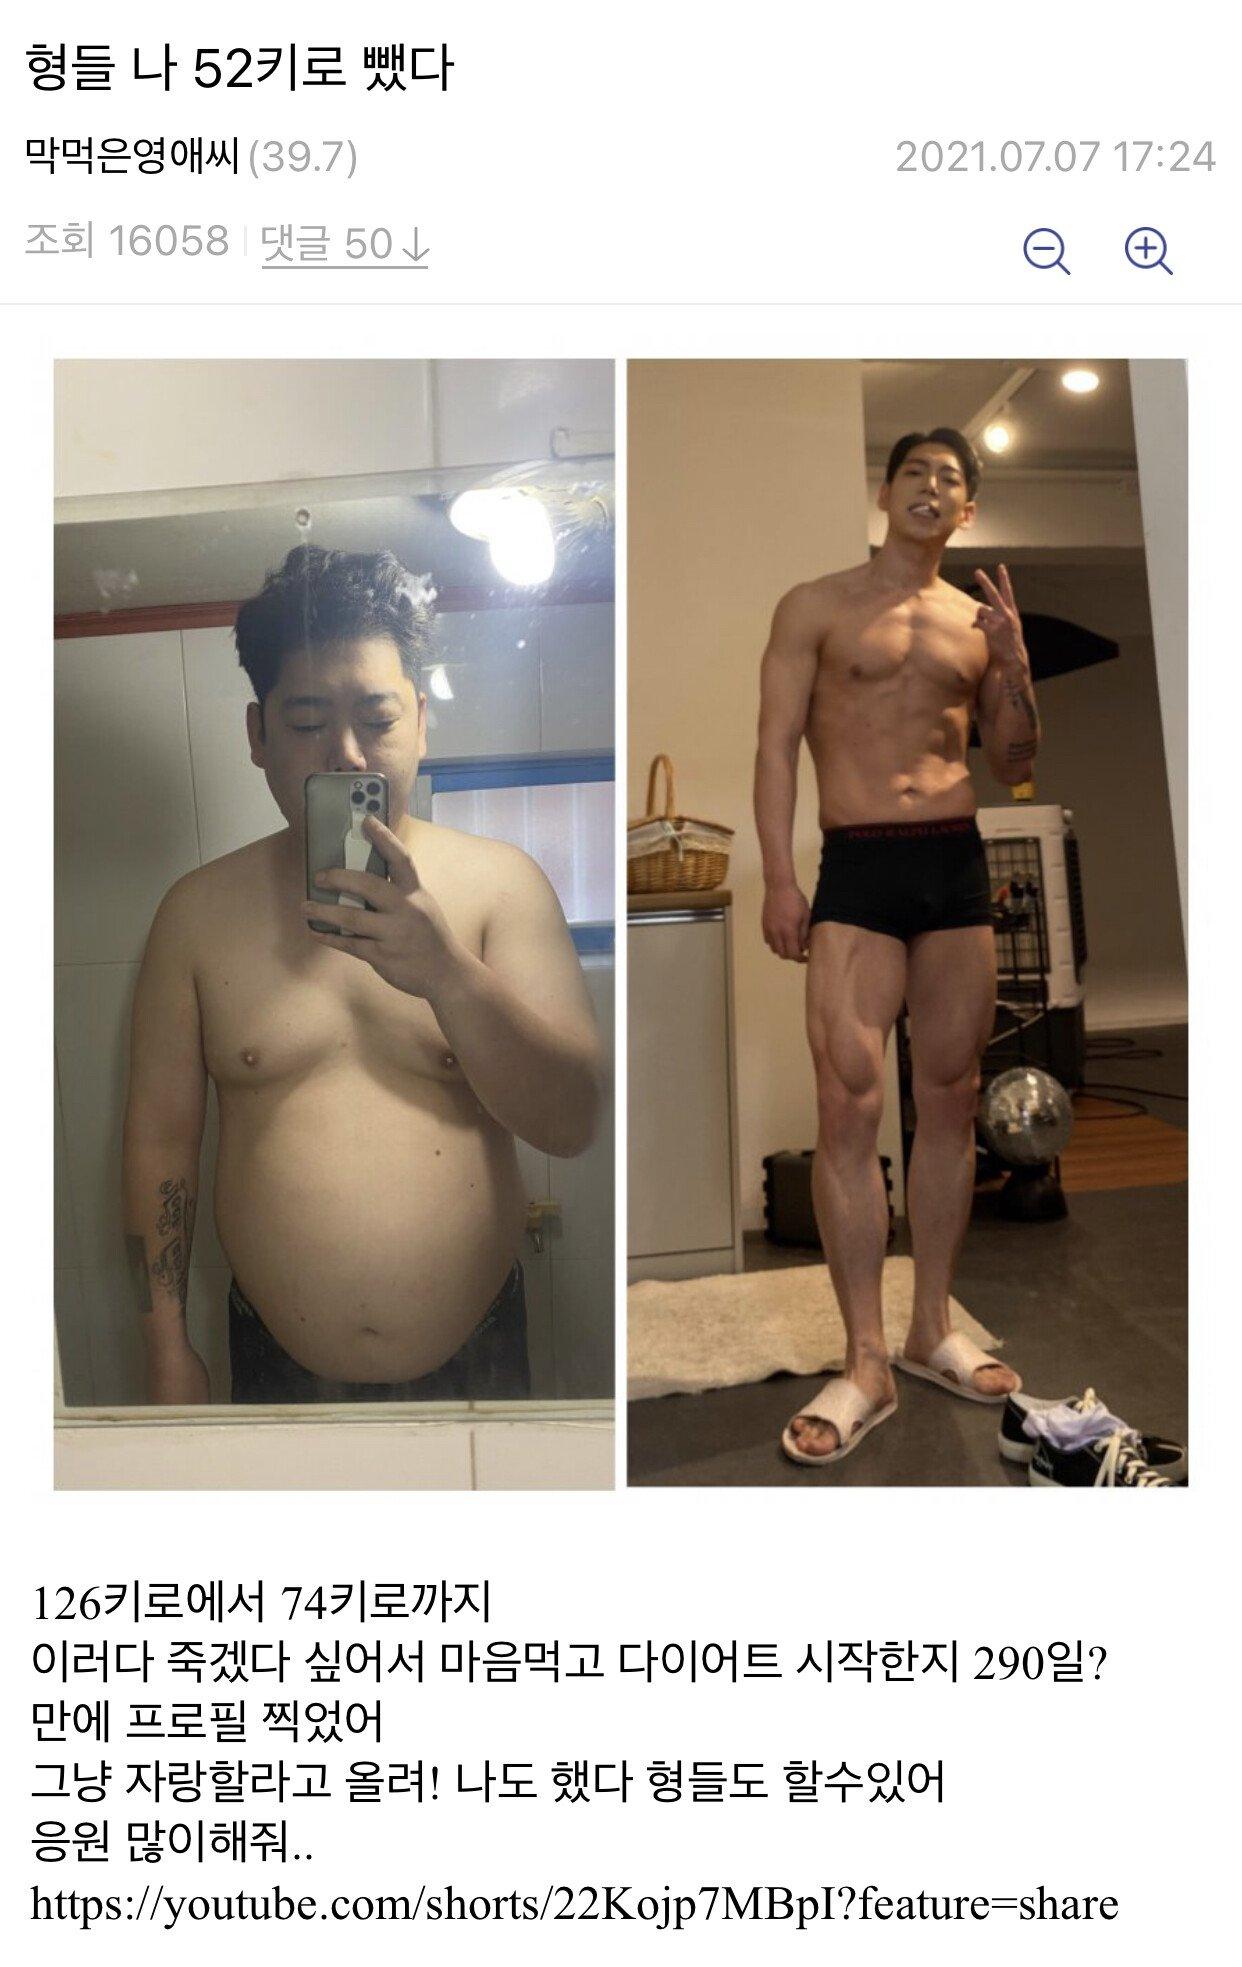 [MK이슈]전혜빈‧이준기 결별, 요란한 시작 허무한 결말 - 스타